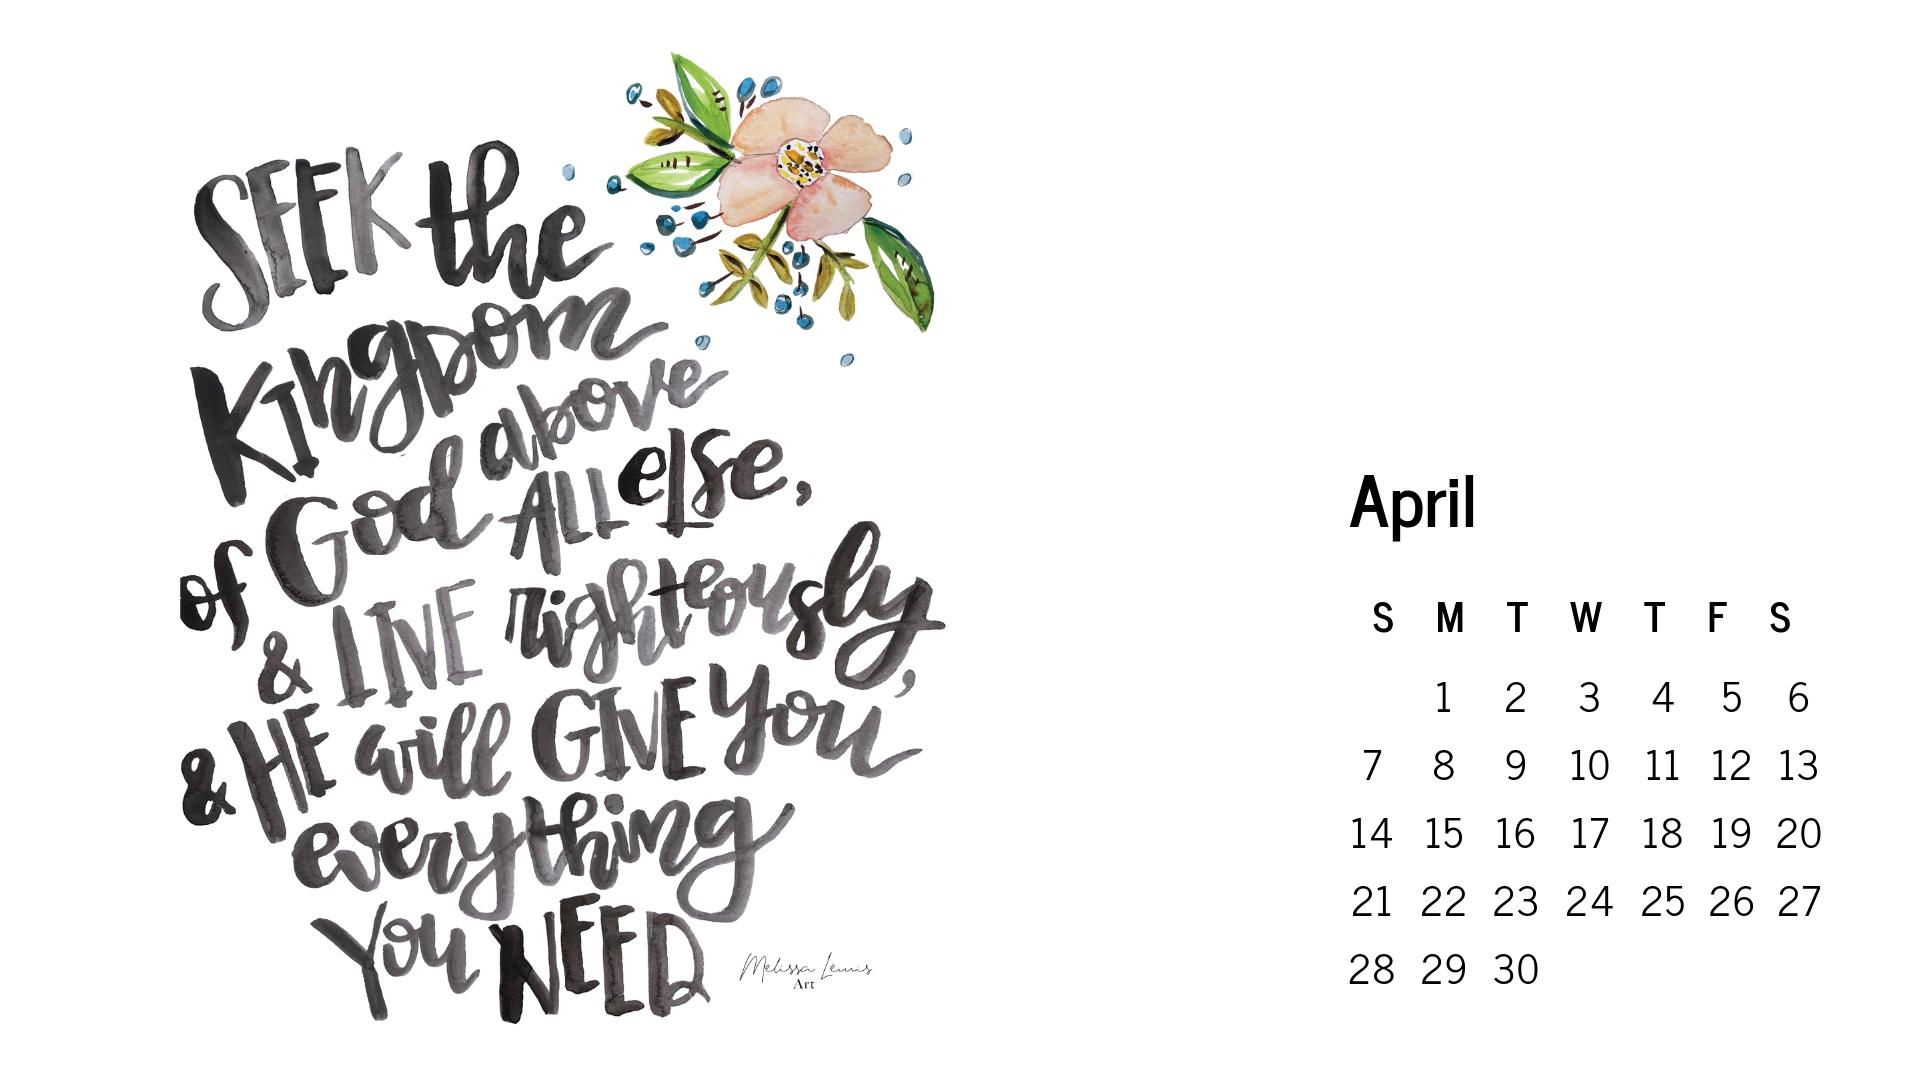 Melissa Lewis Art Hand Lettered Scripture Free Wallpaper with Calendar Download.